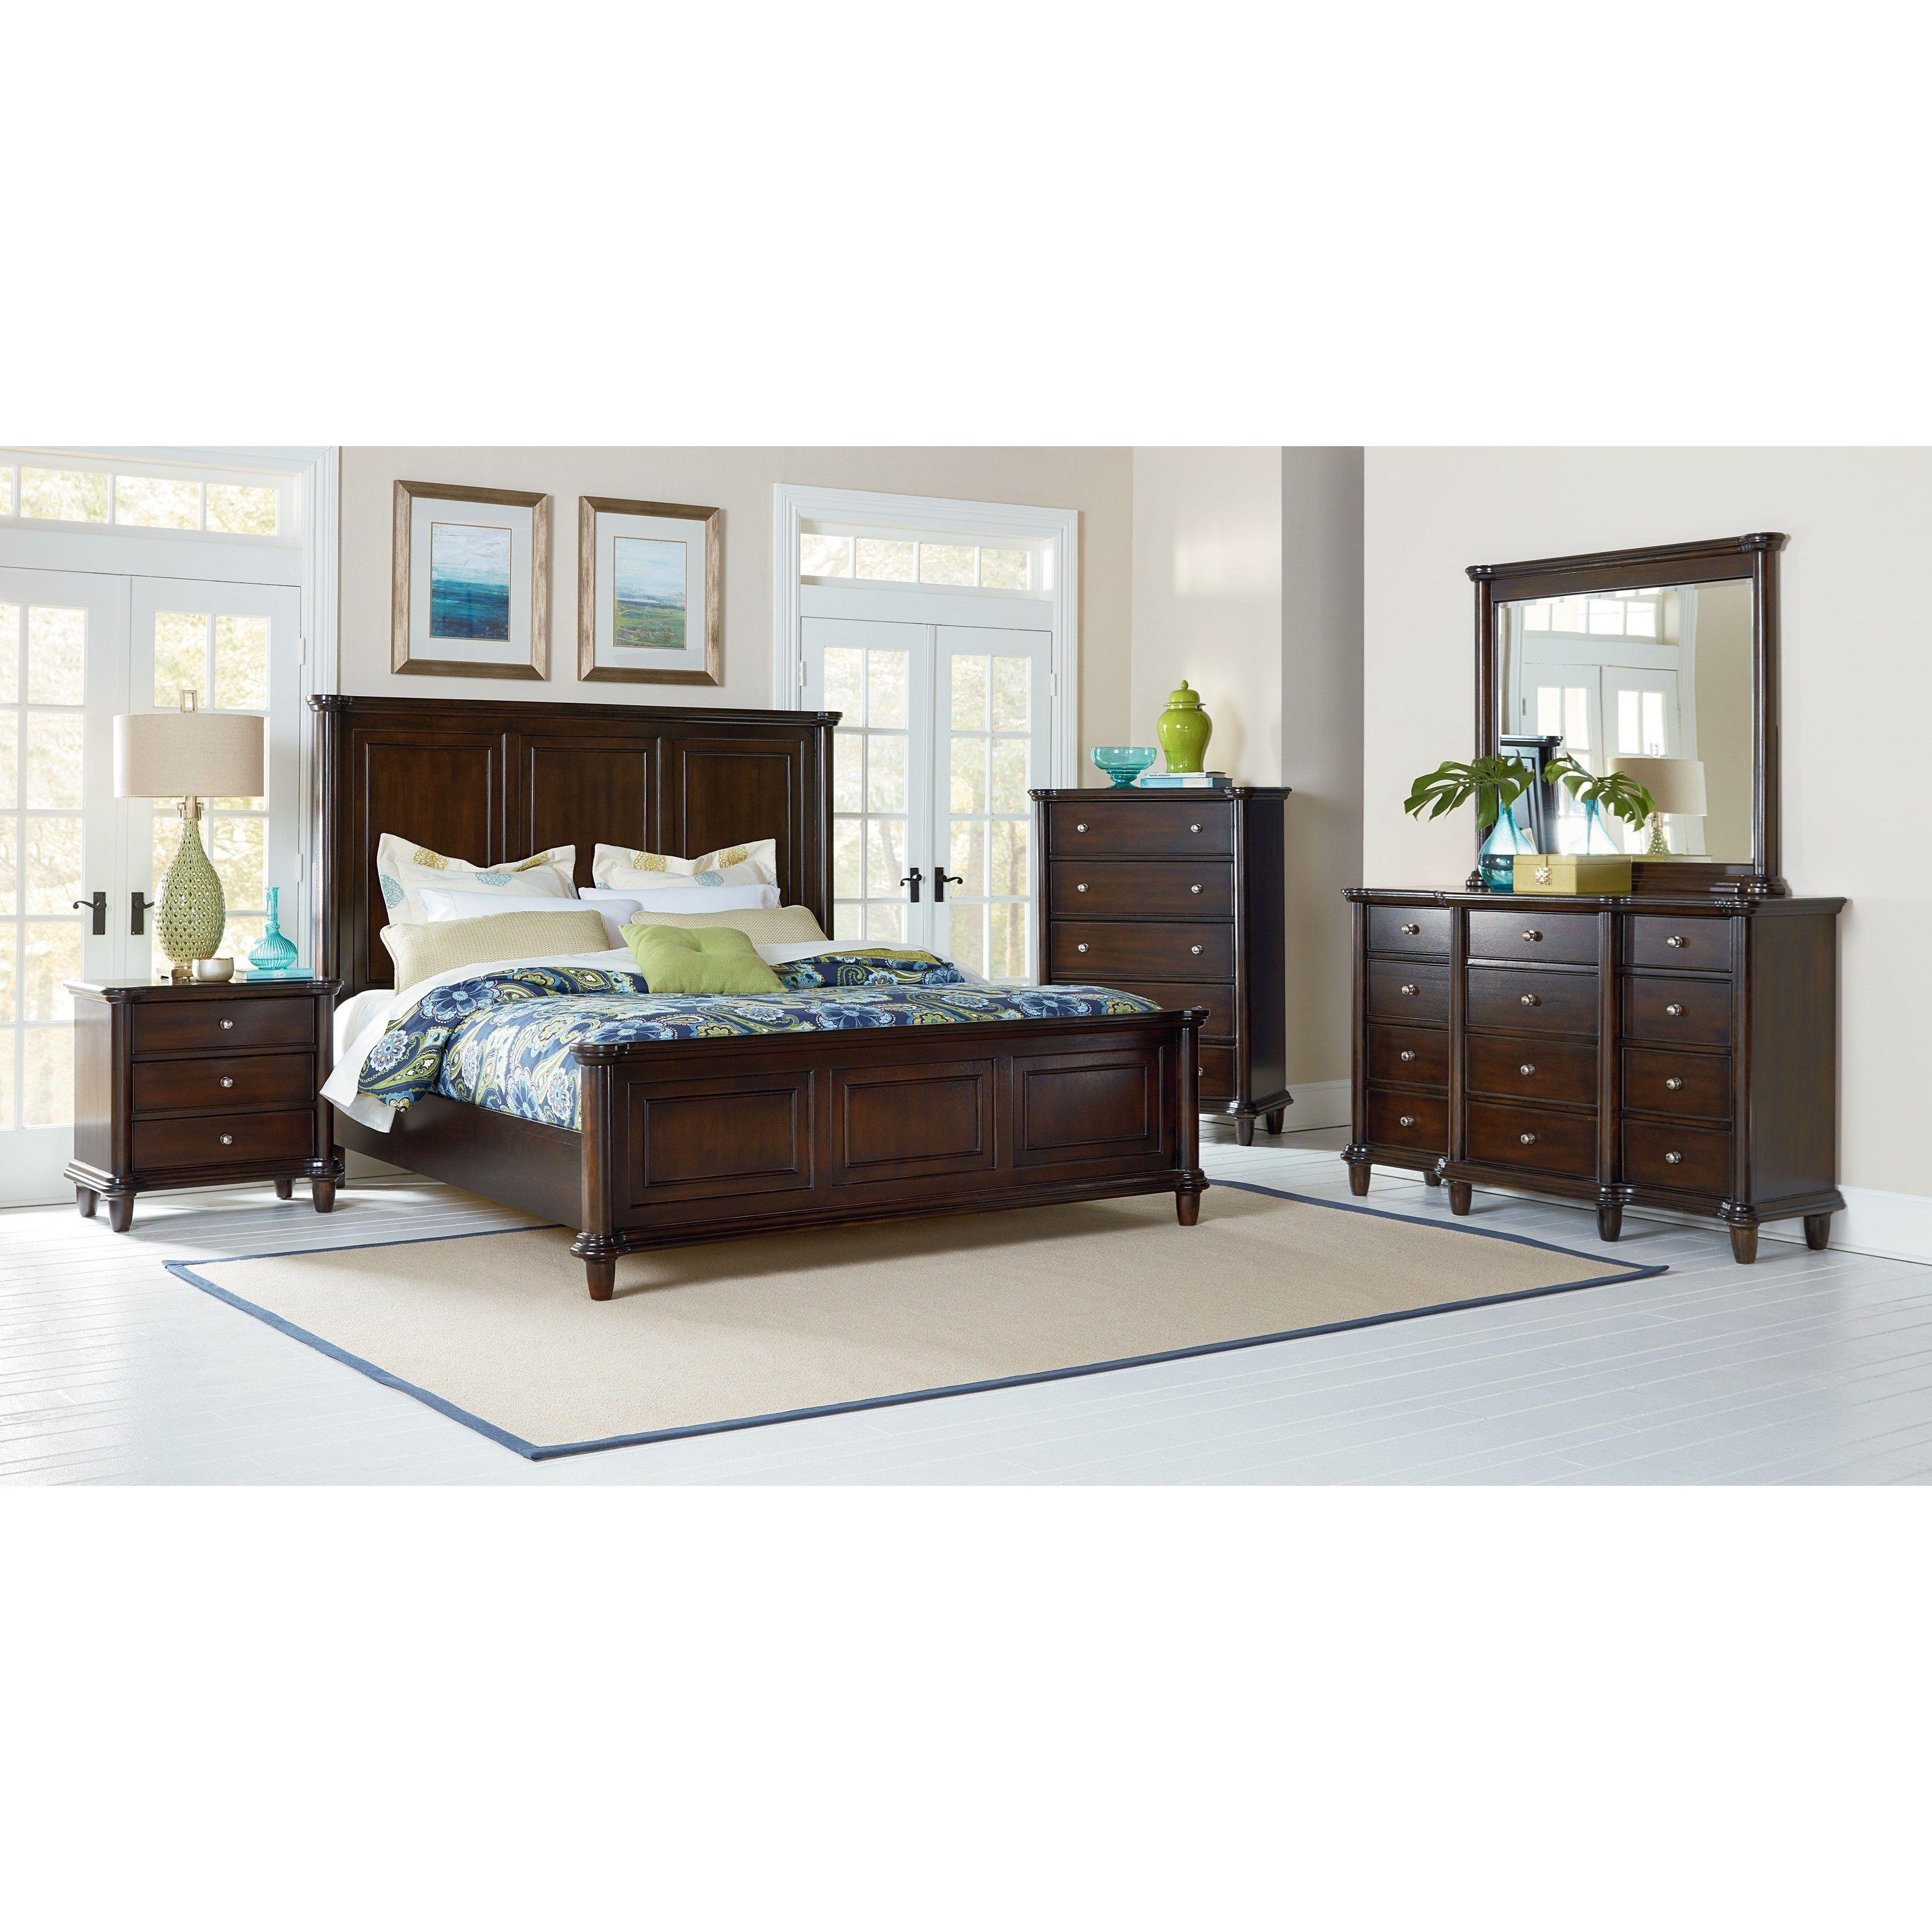 Bedroom Furniture Nashville the kingsley queen bedroom groupstandard furniture from royal